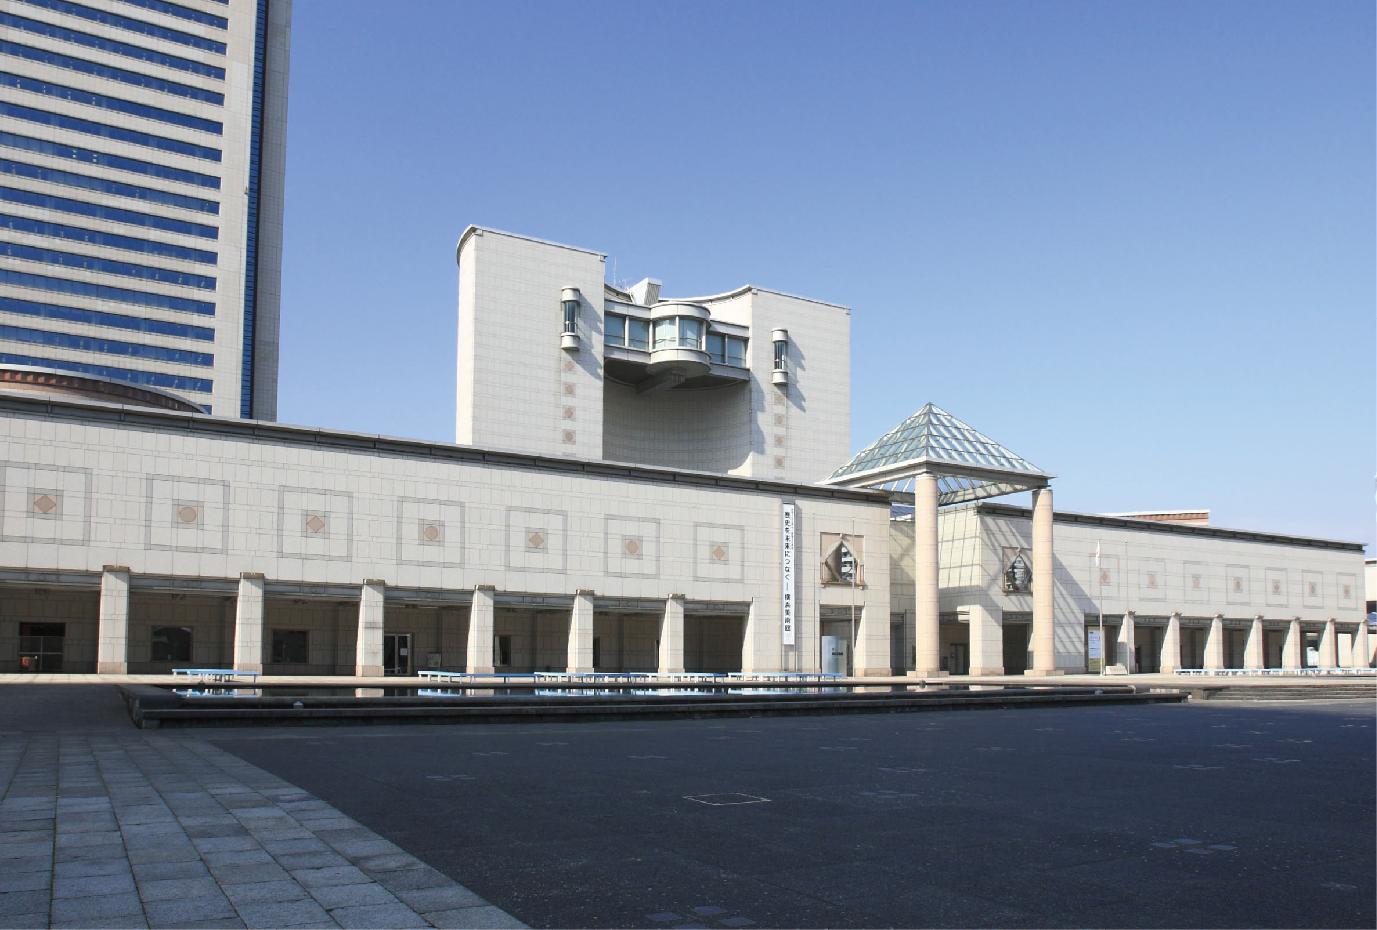 MUSEO DE ARTE DE YOKOHAMA